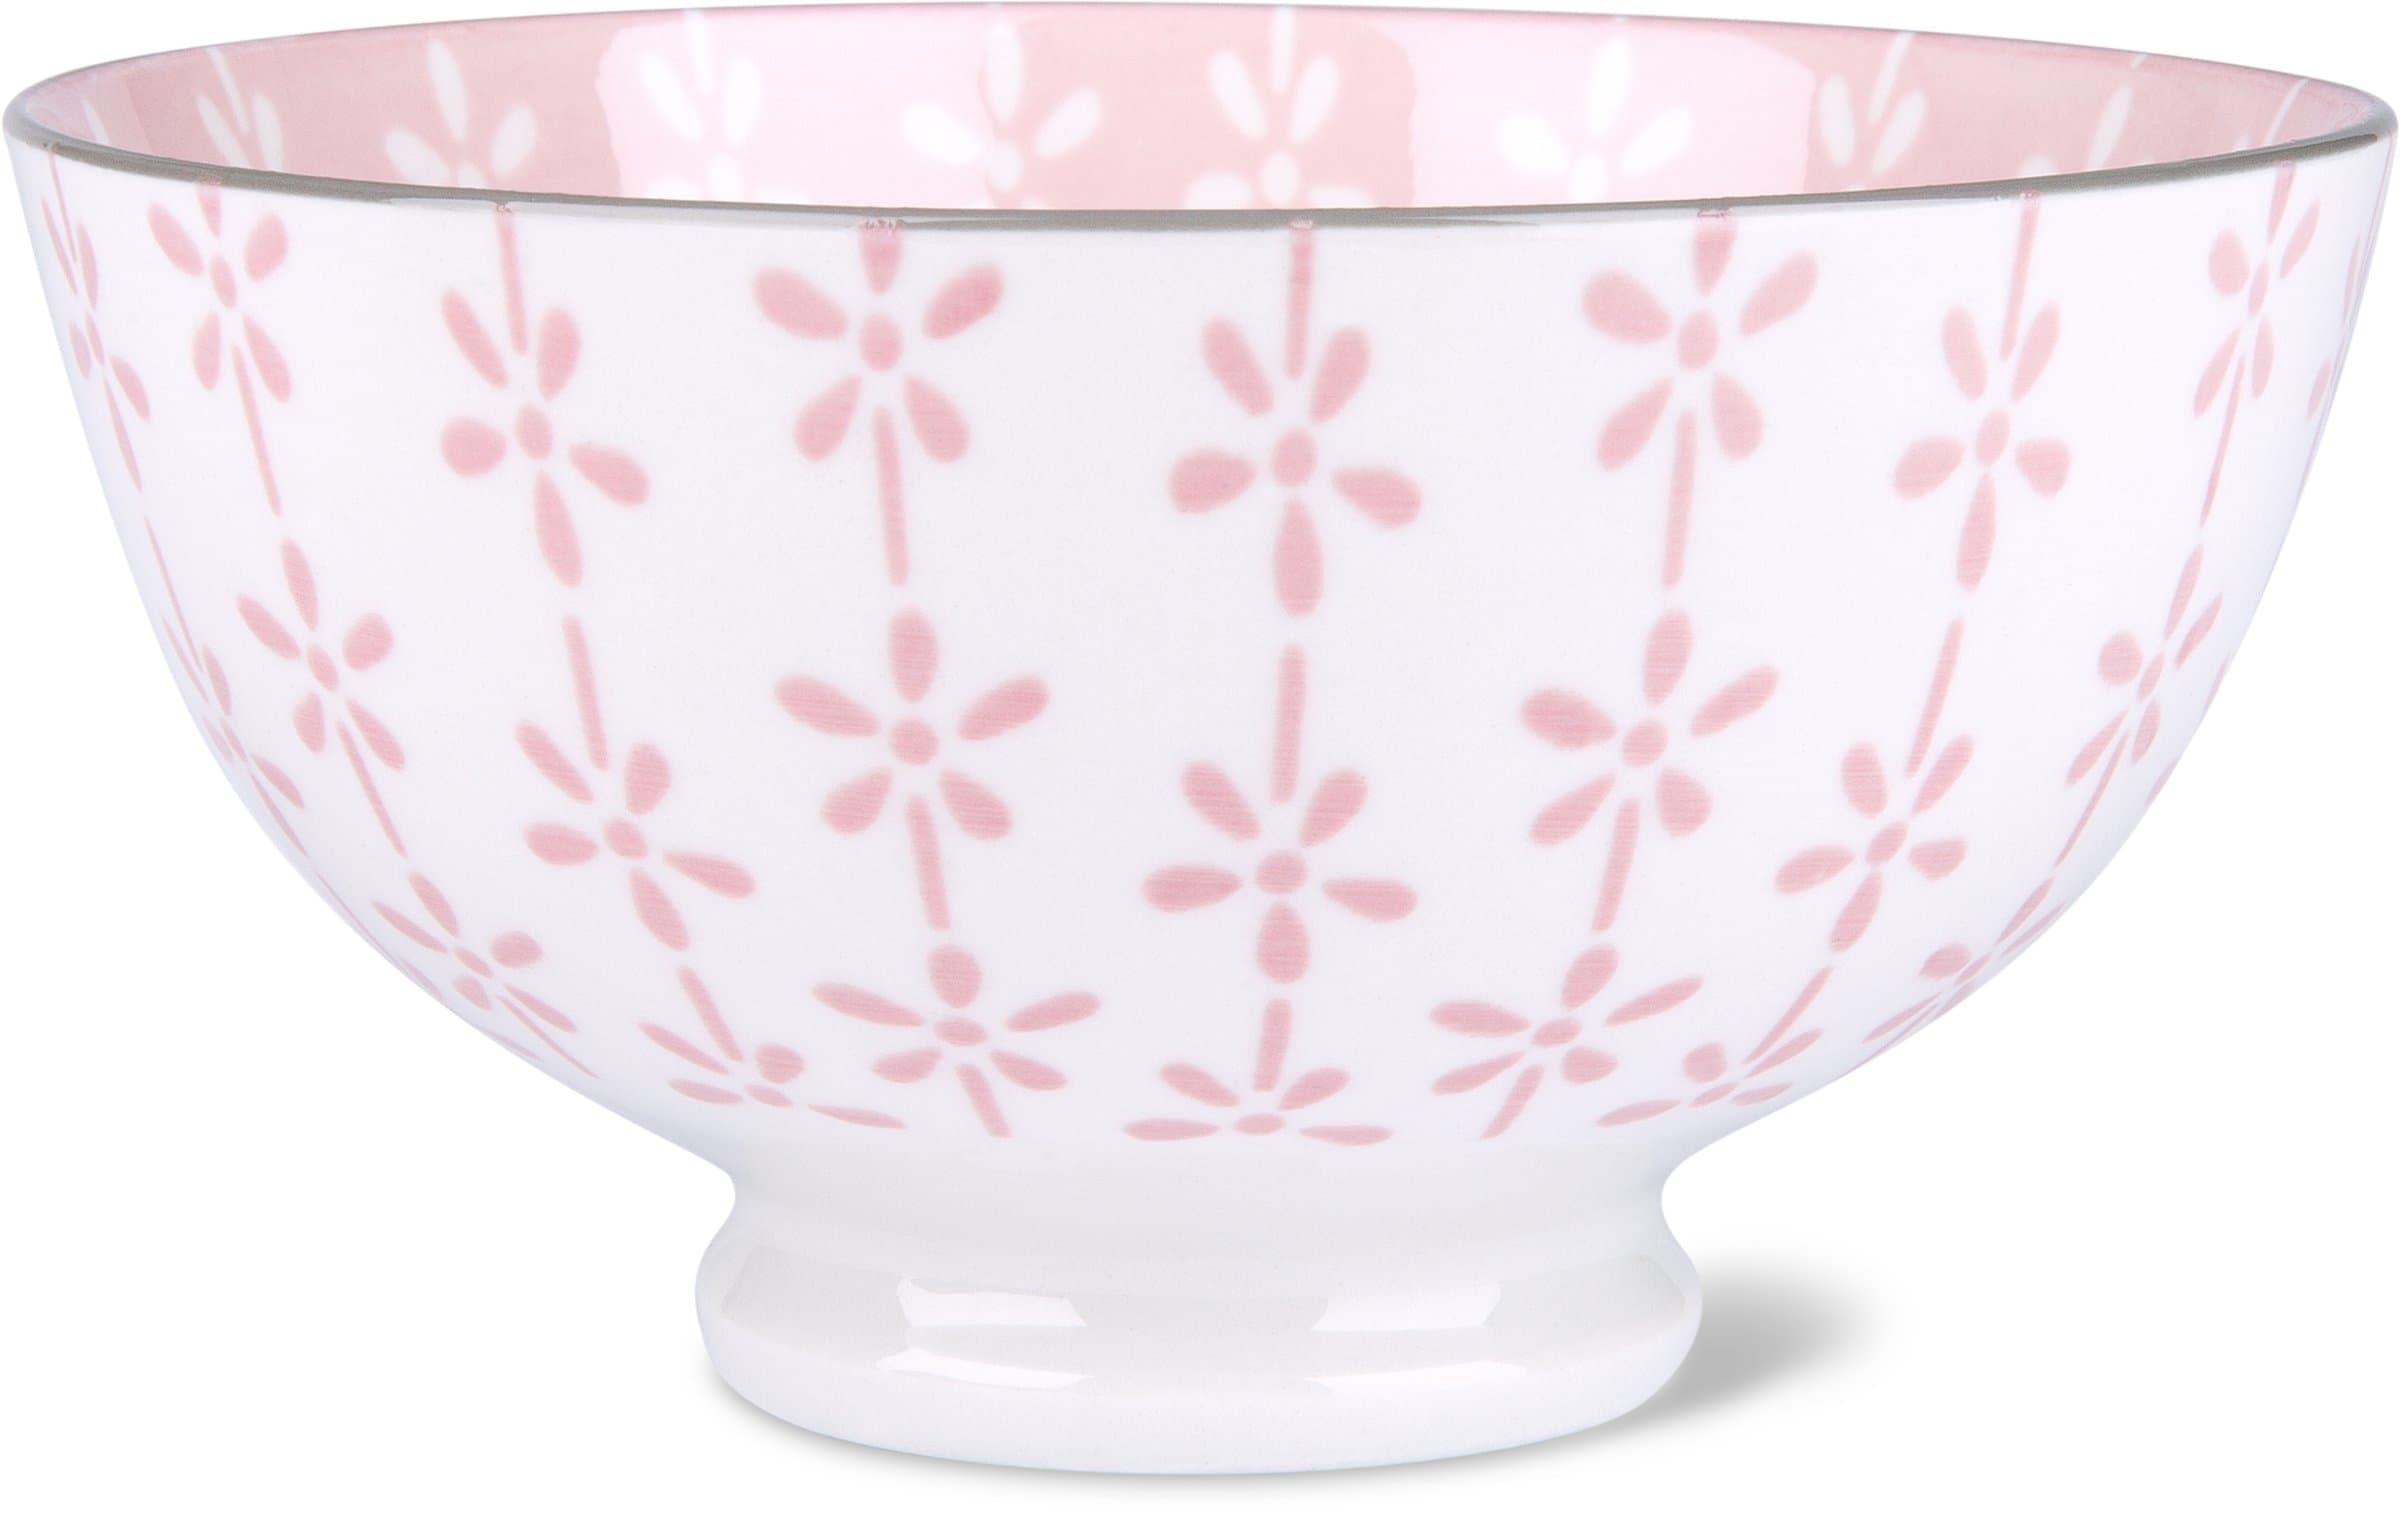 Cucina & Tavola Bowl klein